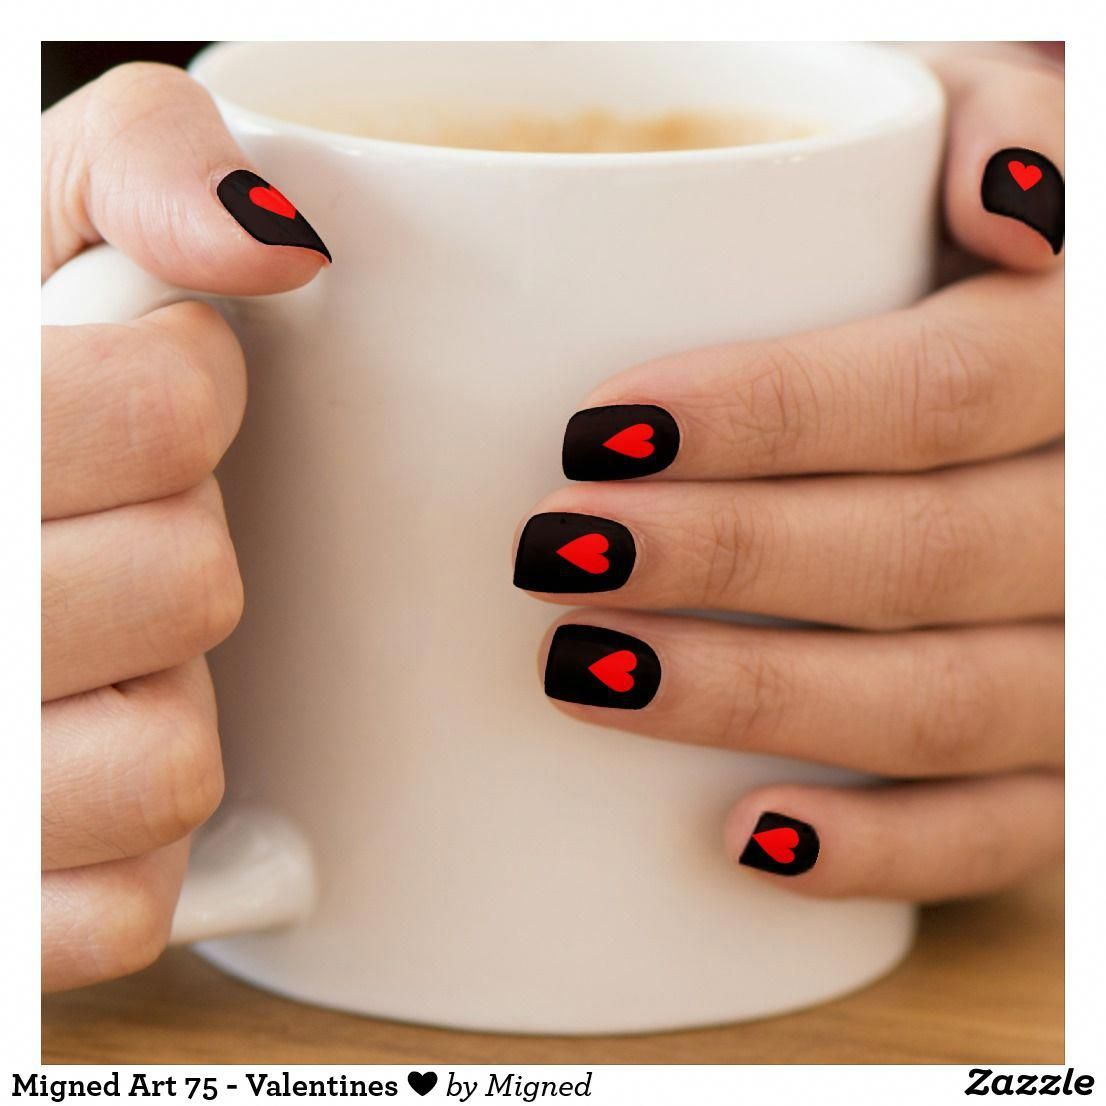 Migned Art 75 - Valentines Minx Nail Art | Zazzle.com